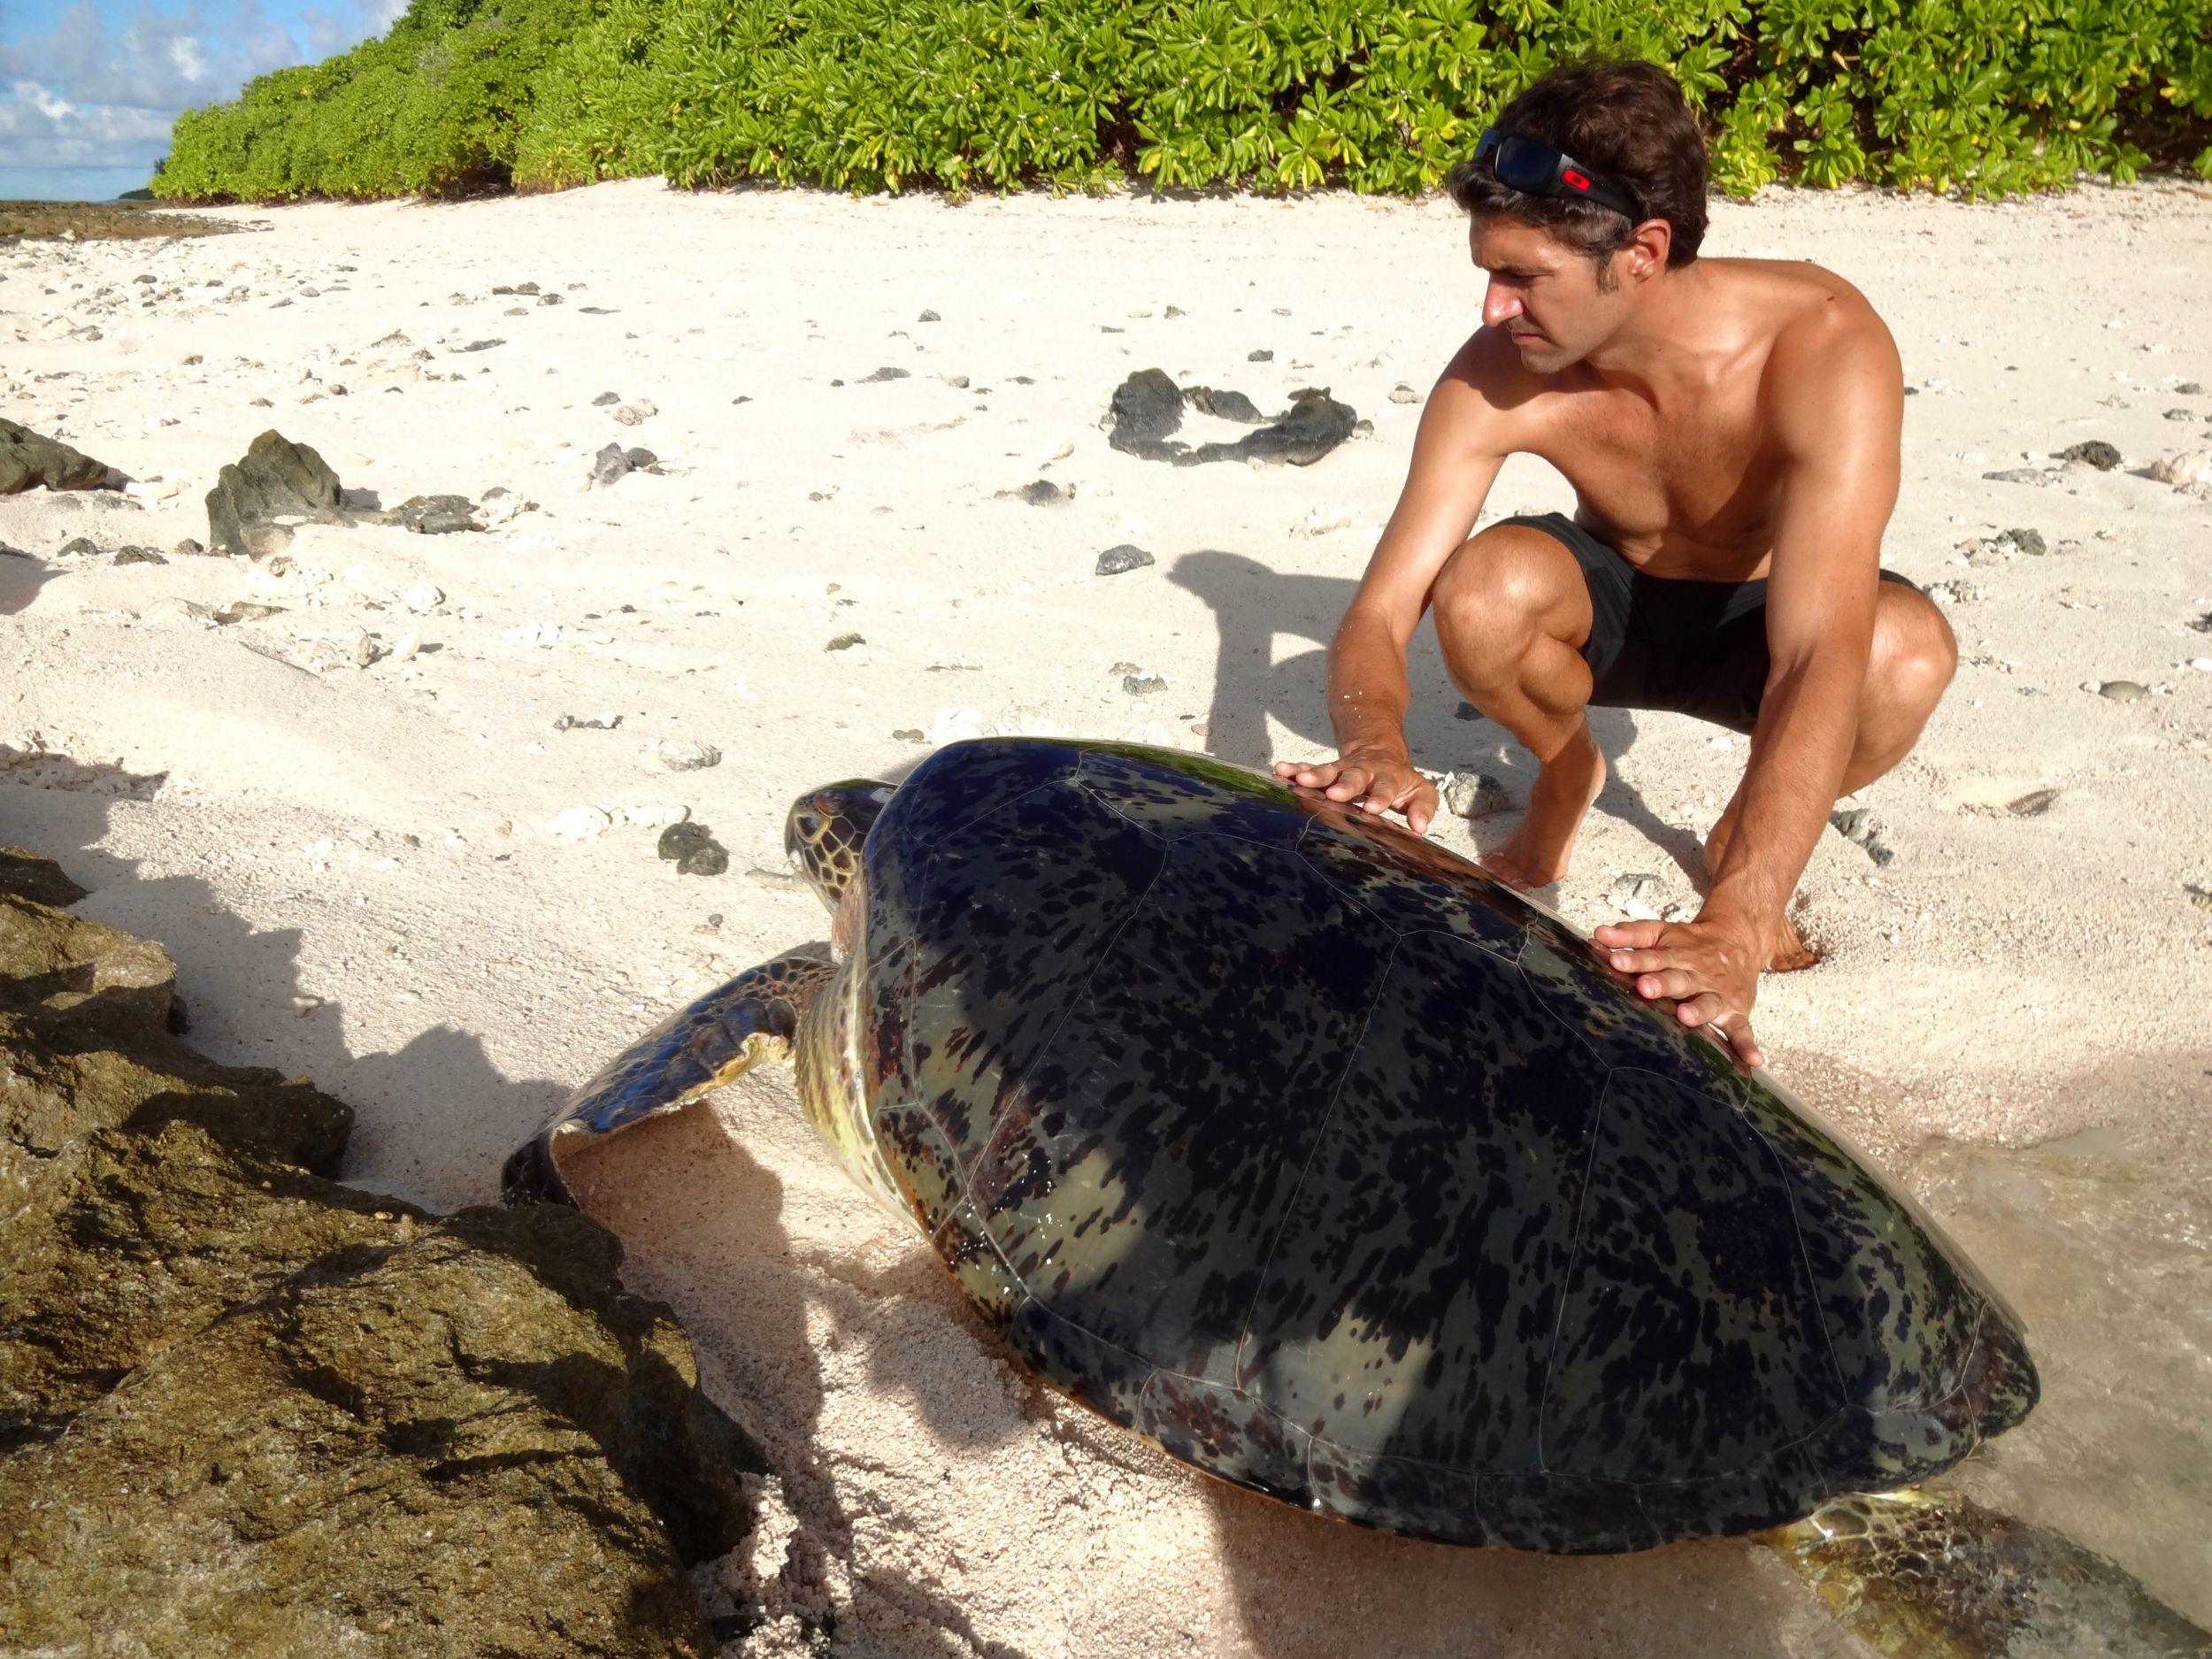 Pep avec une tortue femelle verte(2)